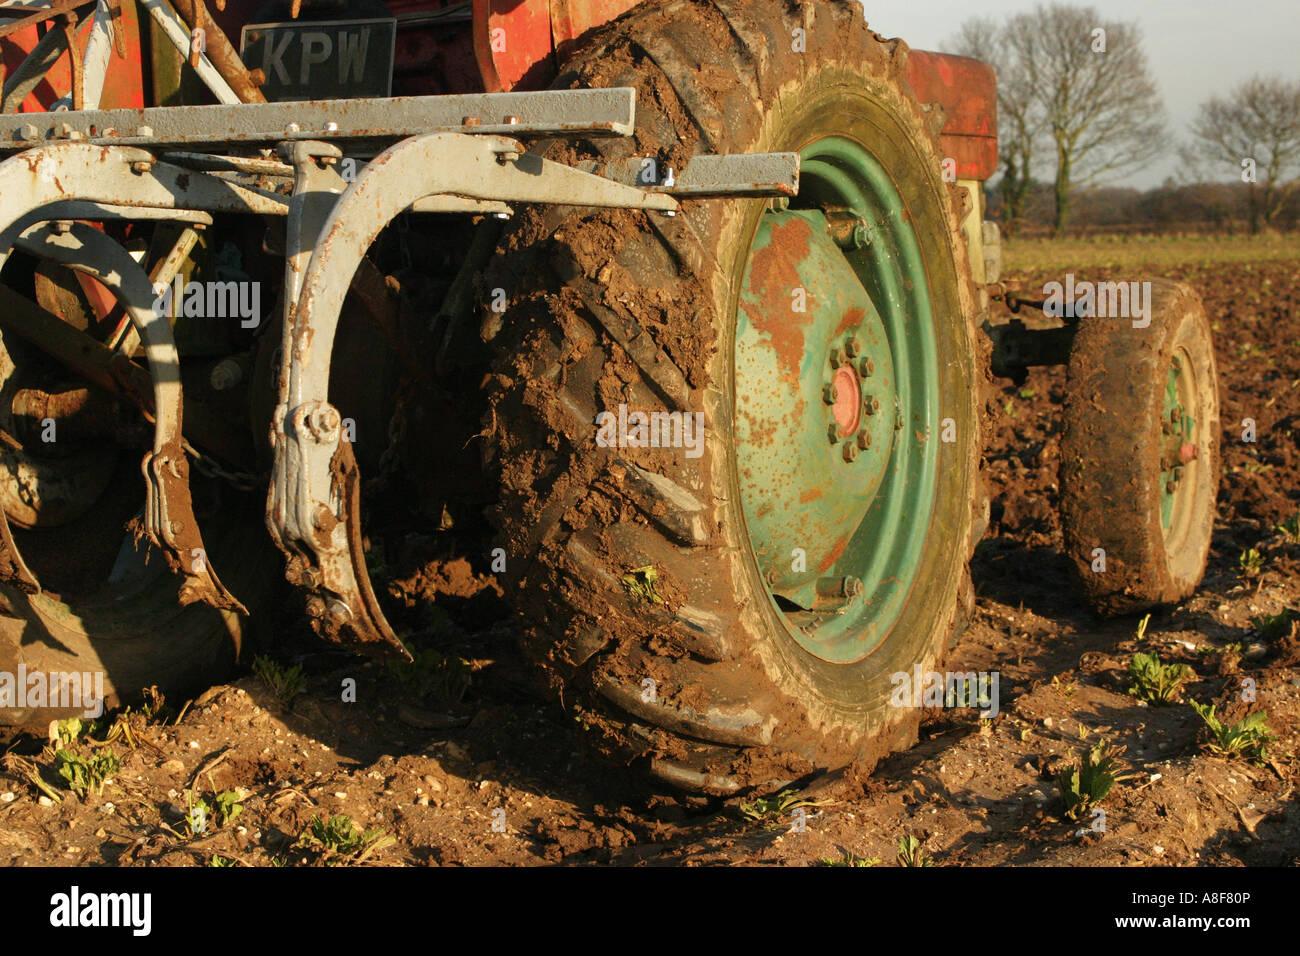 Tractor Vintage Agriculture Ferguson Stock Photos